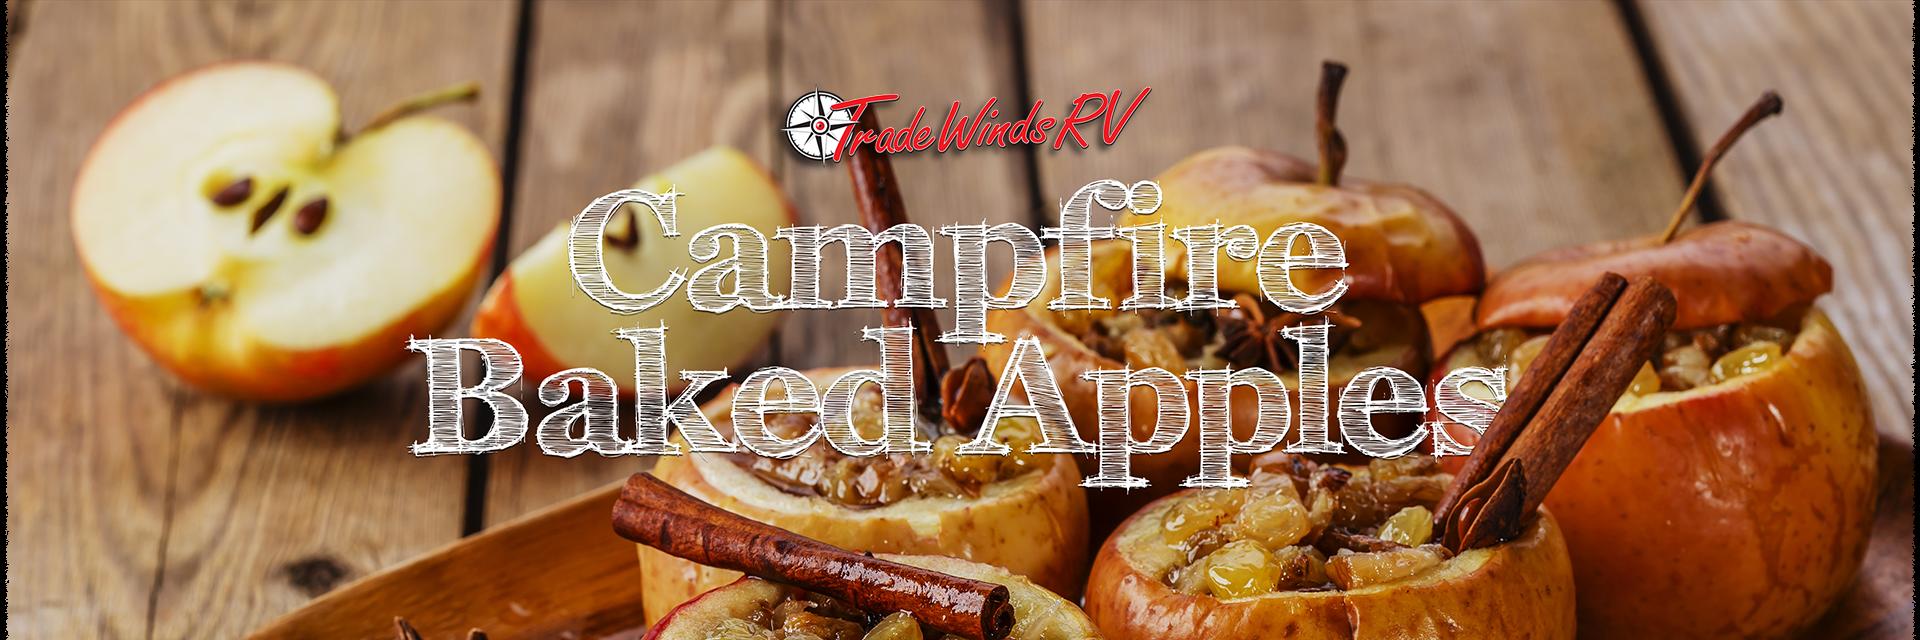 Campfire baked apples banner